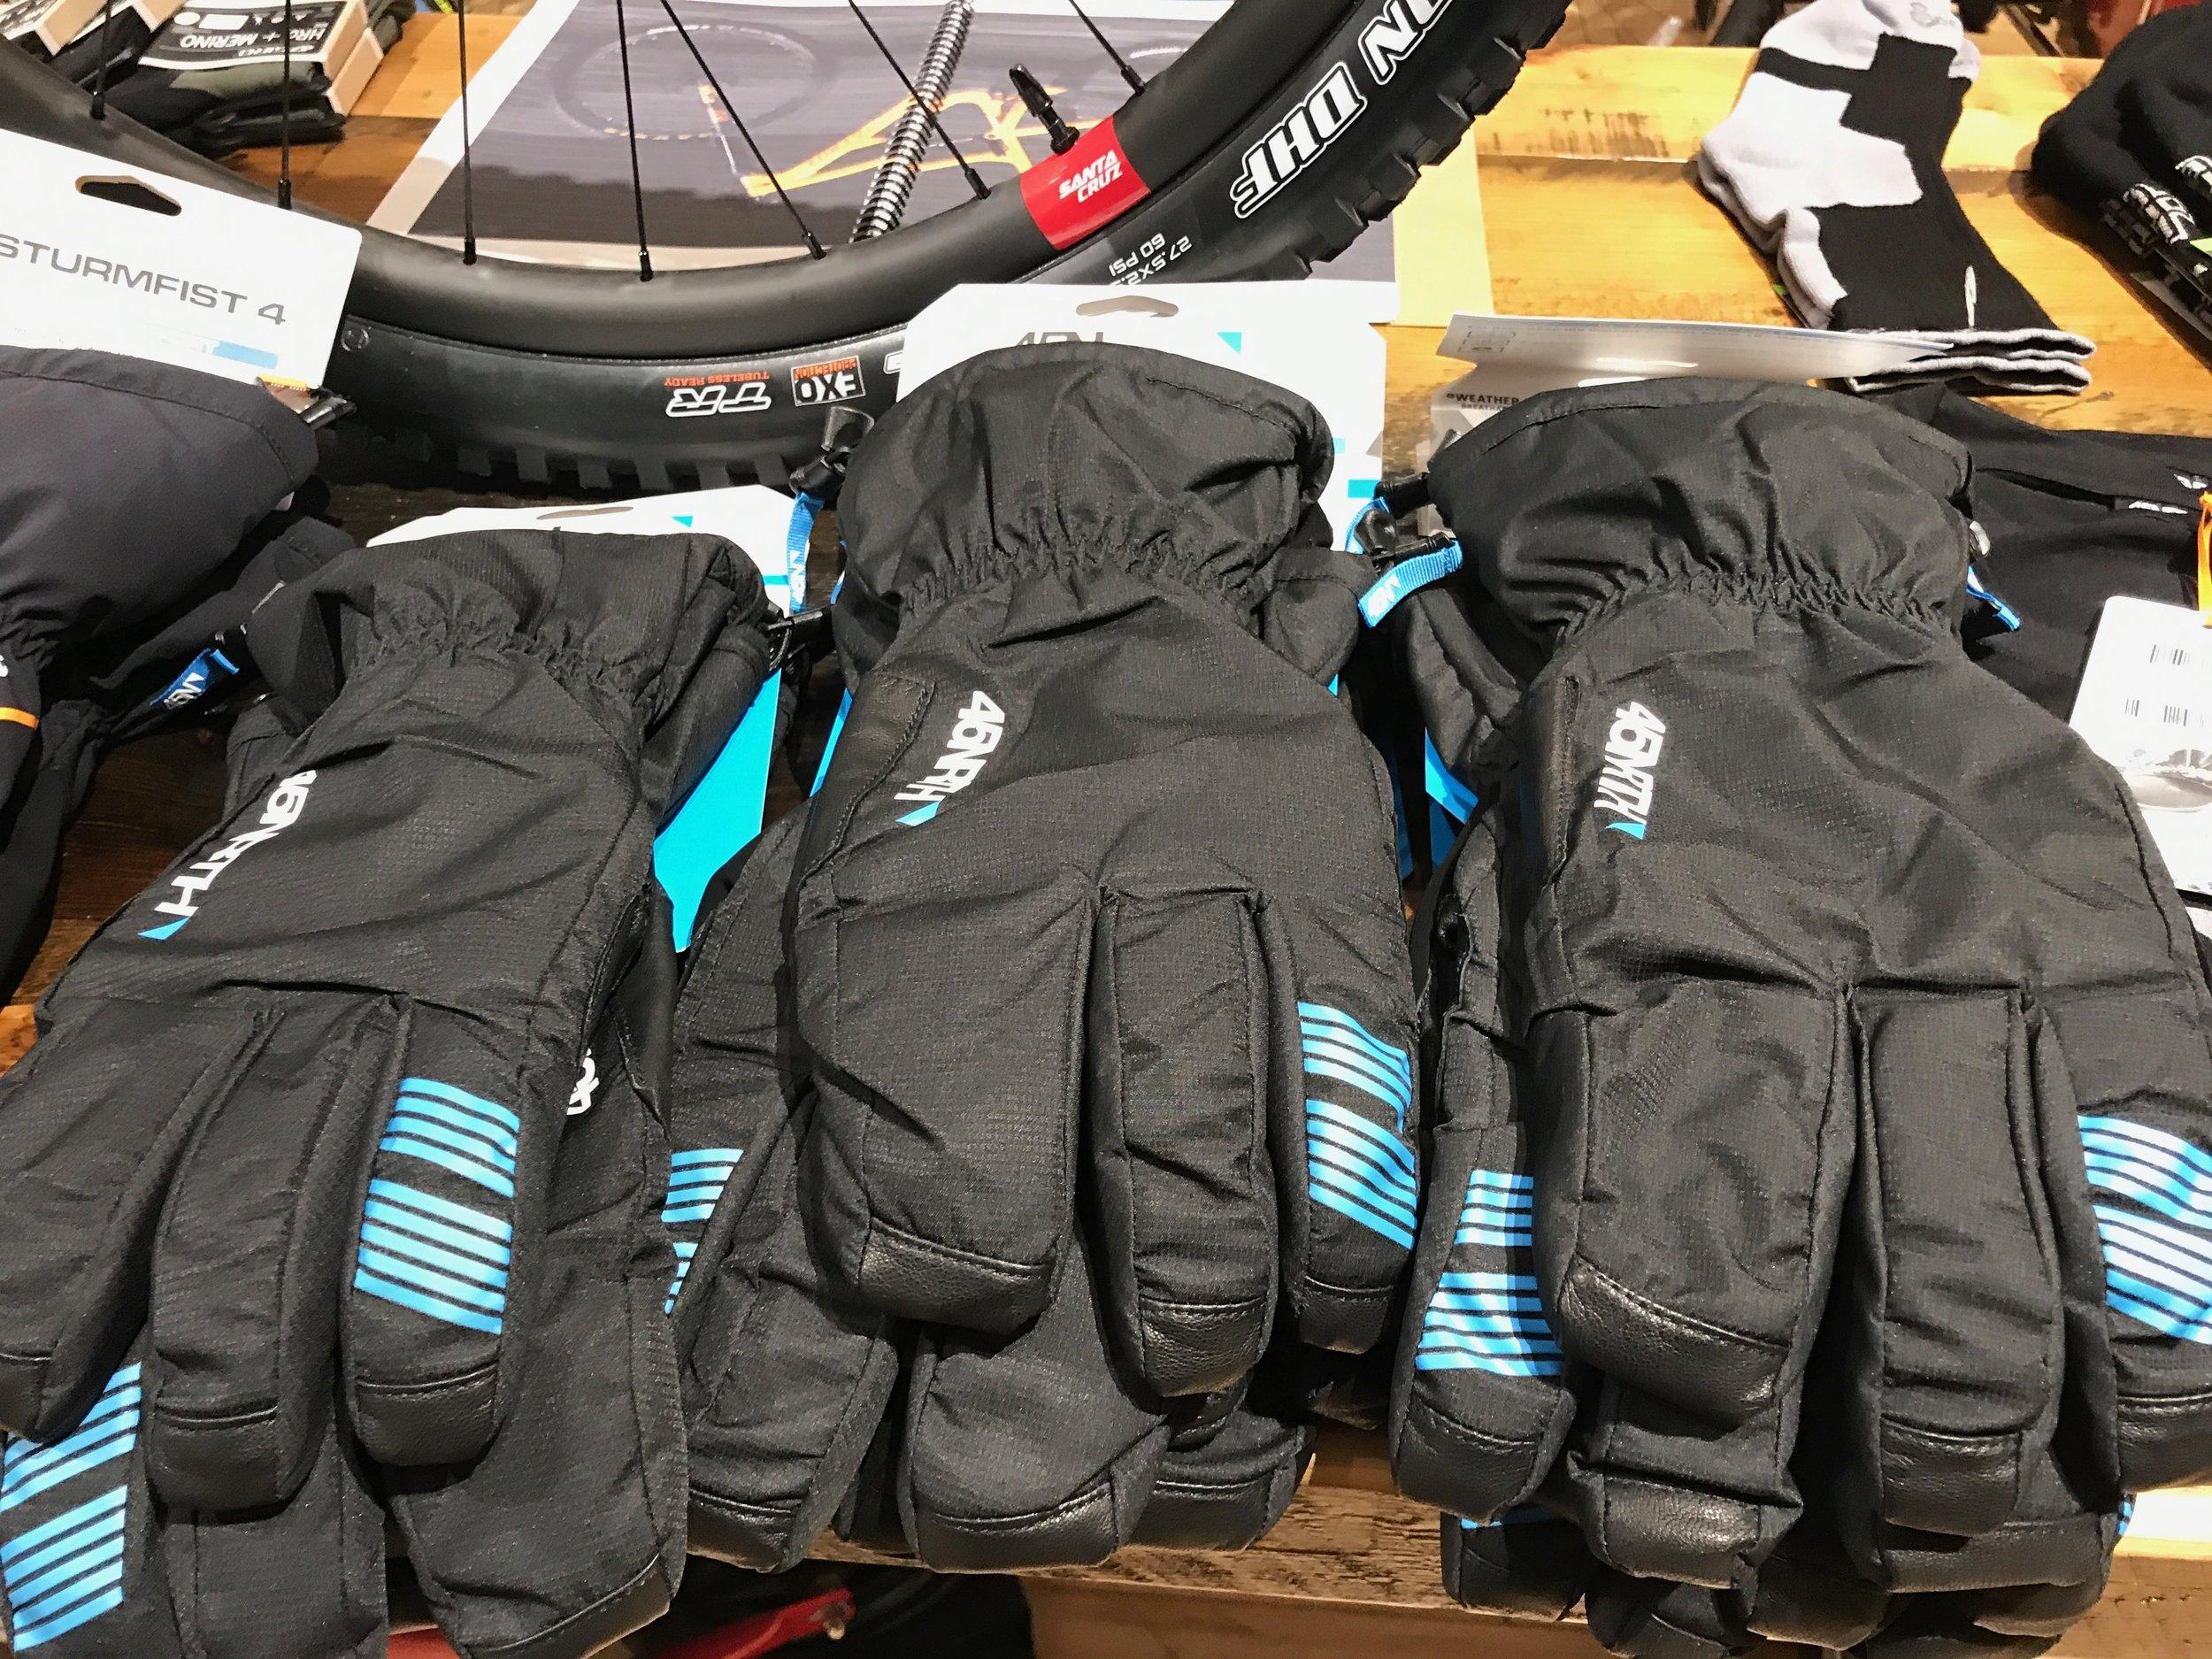 45NRTH's Sturmfist 4 gloves are a great way to keep hands warm when the polar vortex hits.